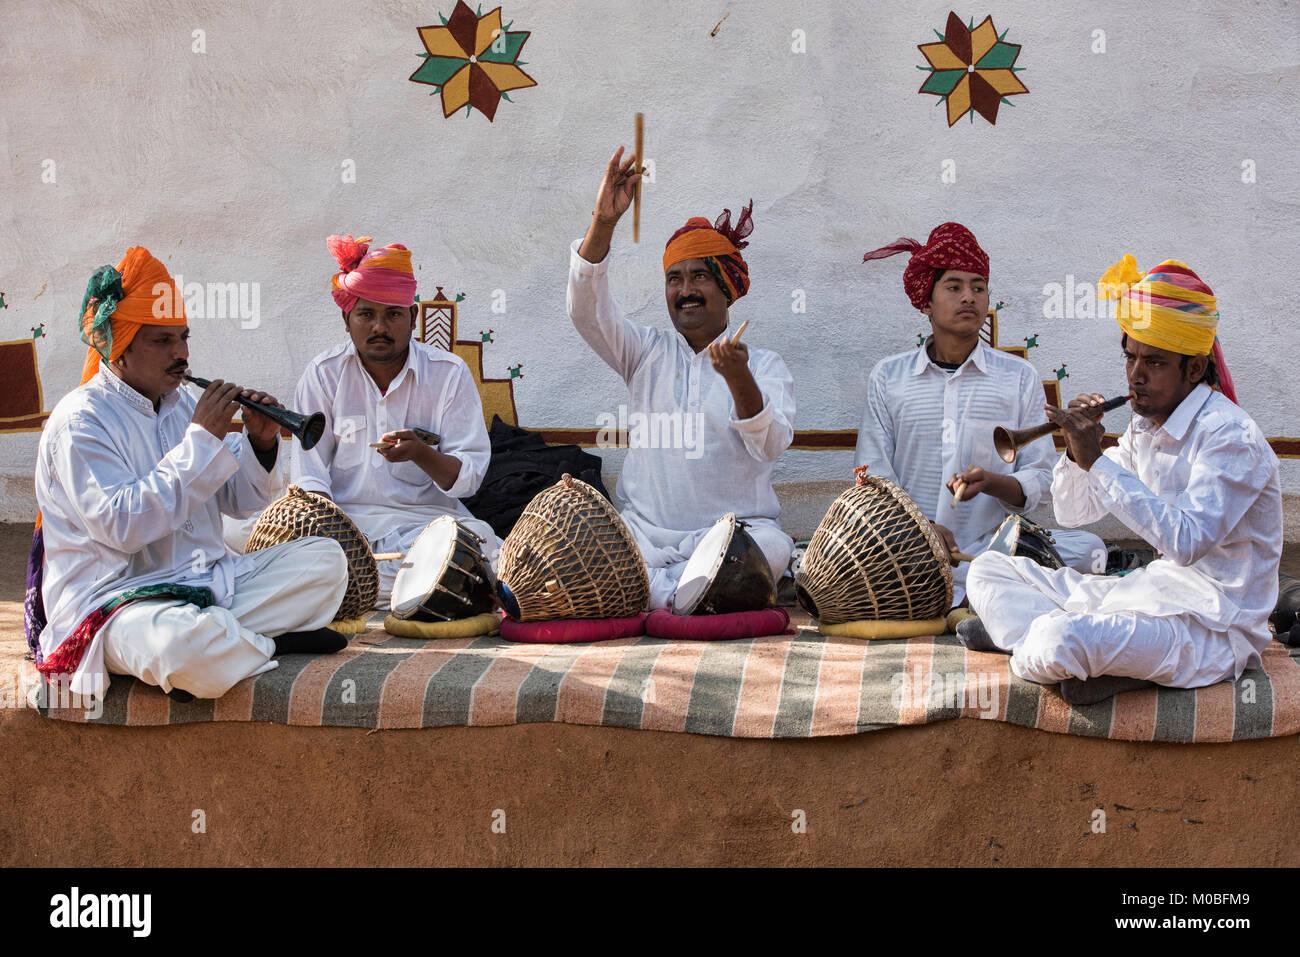 Rajasthani folk musicians, Udaipur, India Stock Photo